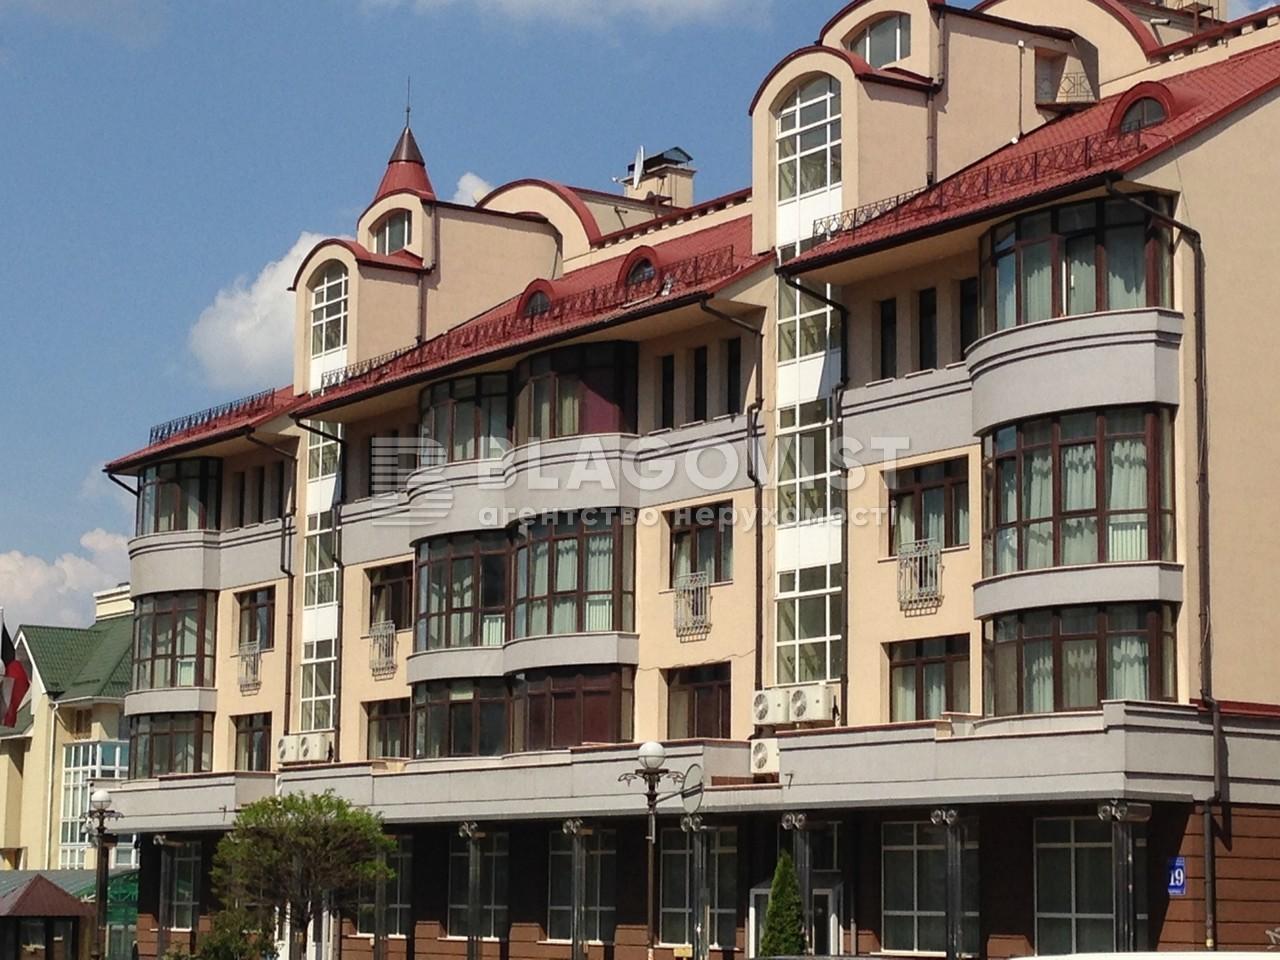 Квартира C-104547, Оболонская набережная, 19 корпус 1, Киев - Фото 2